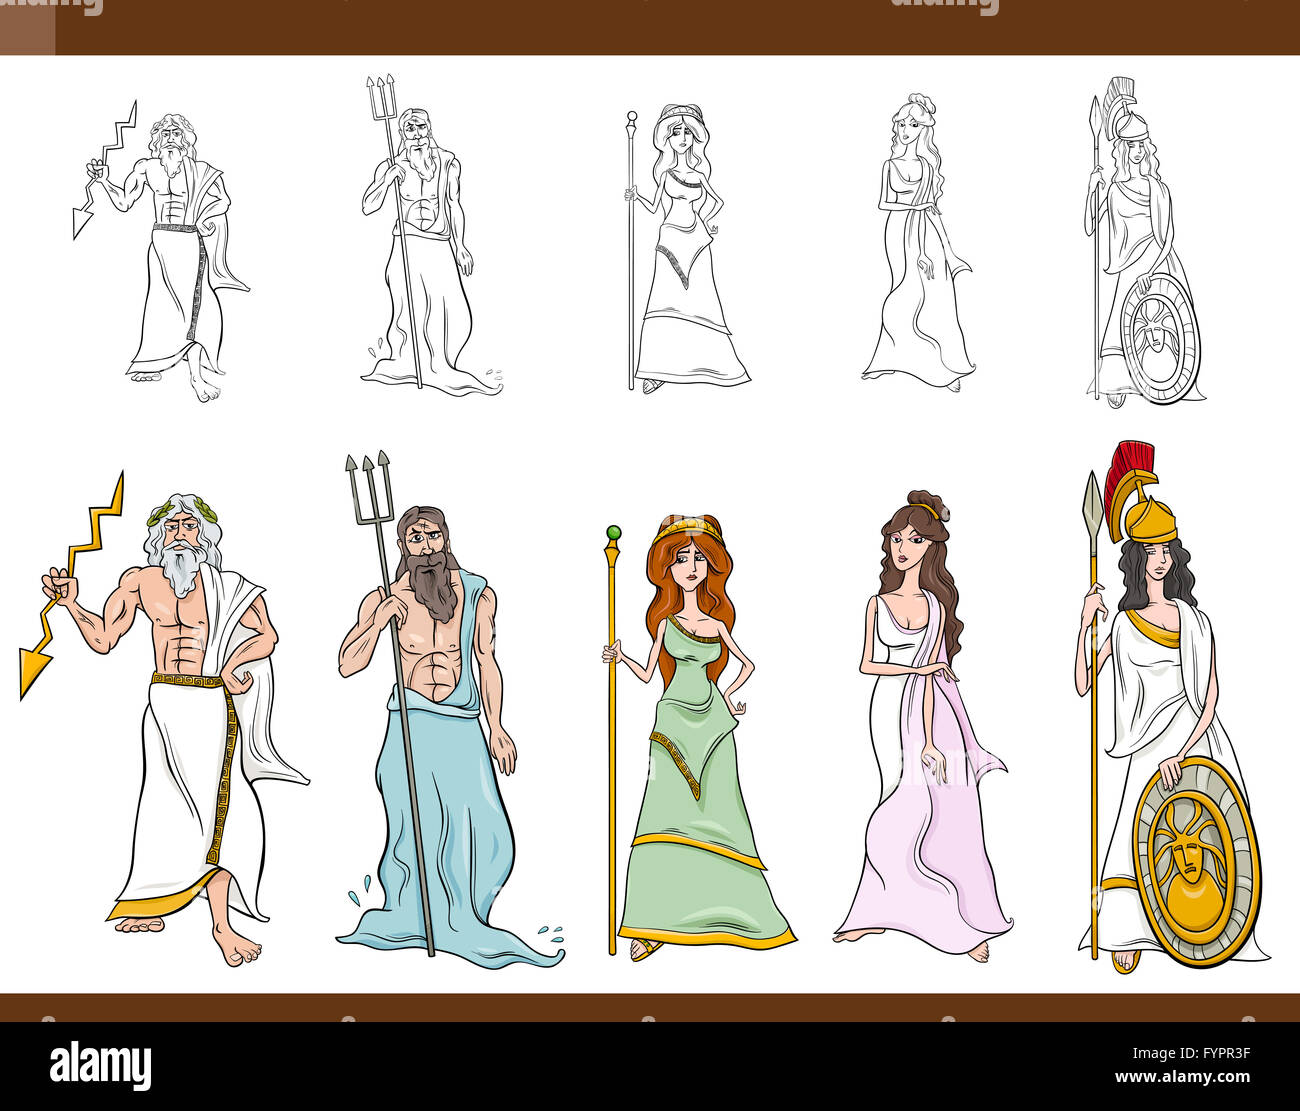 greek gods cartoon illustration - Stock Image